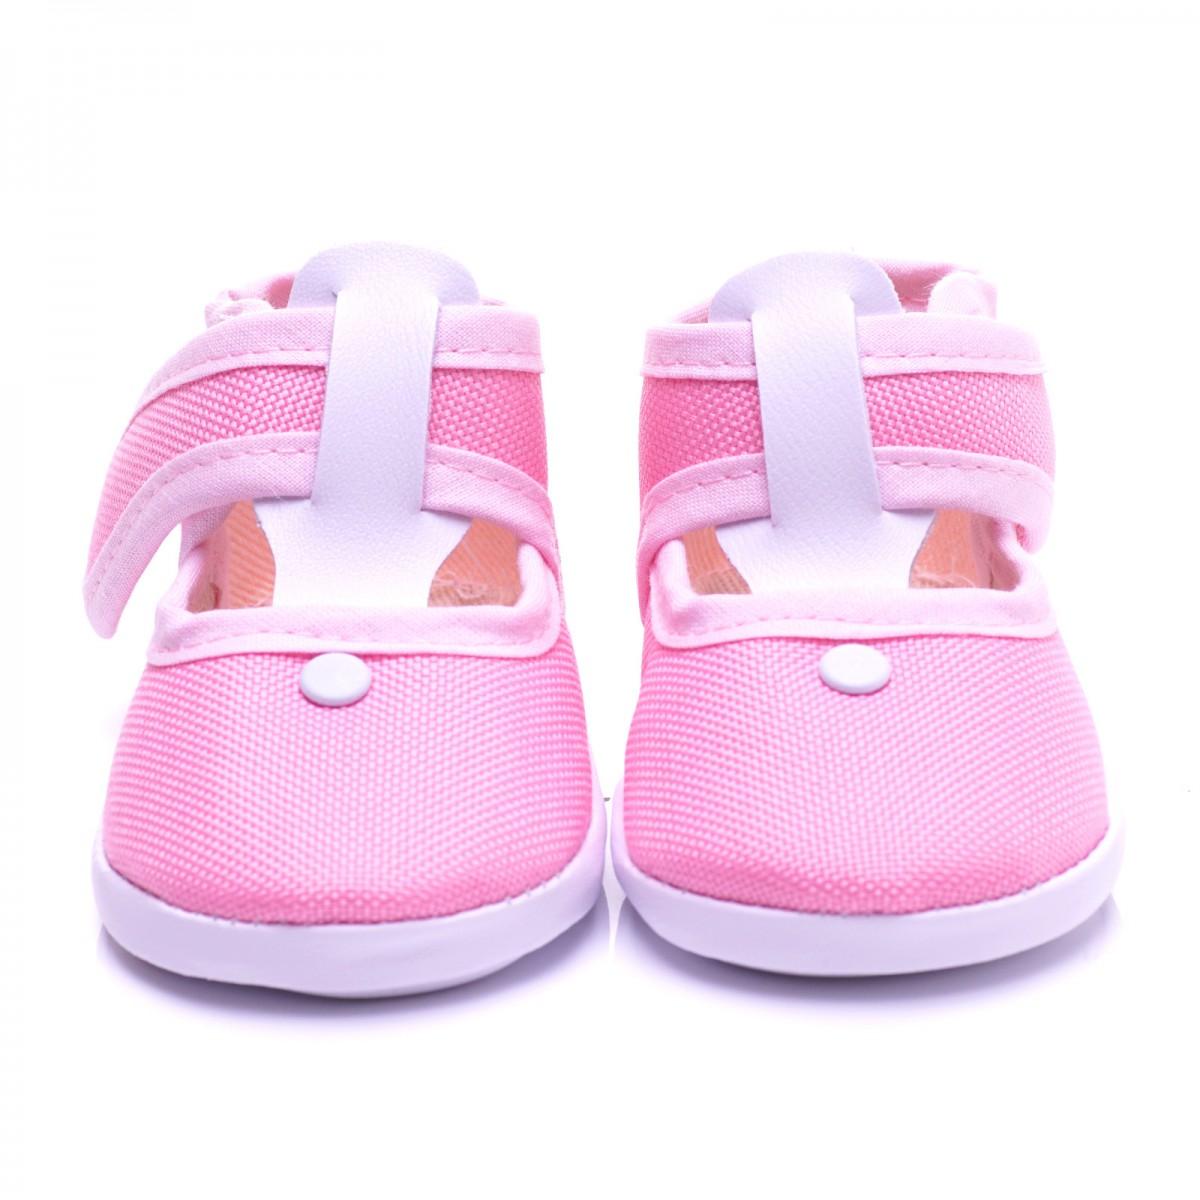 Baby Krabbelschuhe Babyschuhe Junge Mädchen Babytaufschuhe im Shop BS207